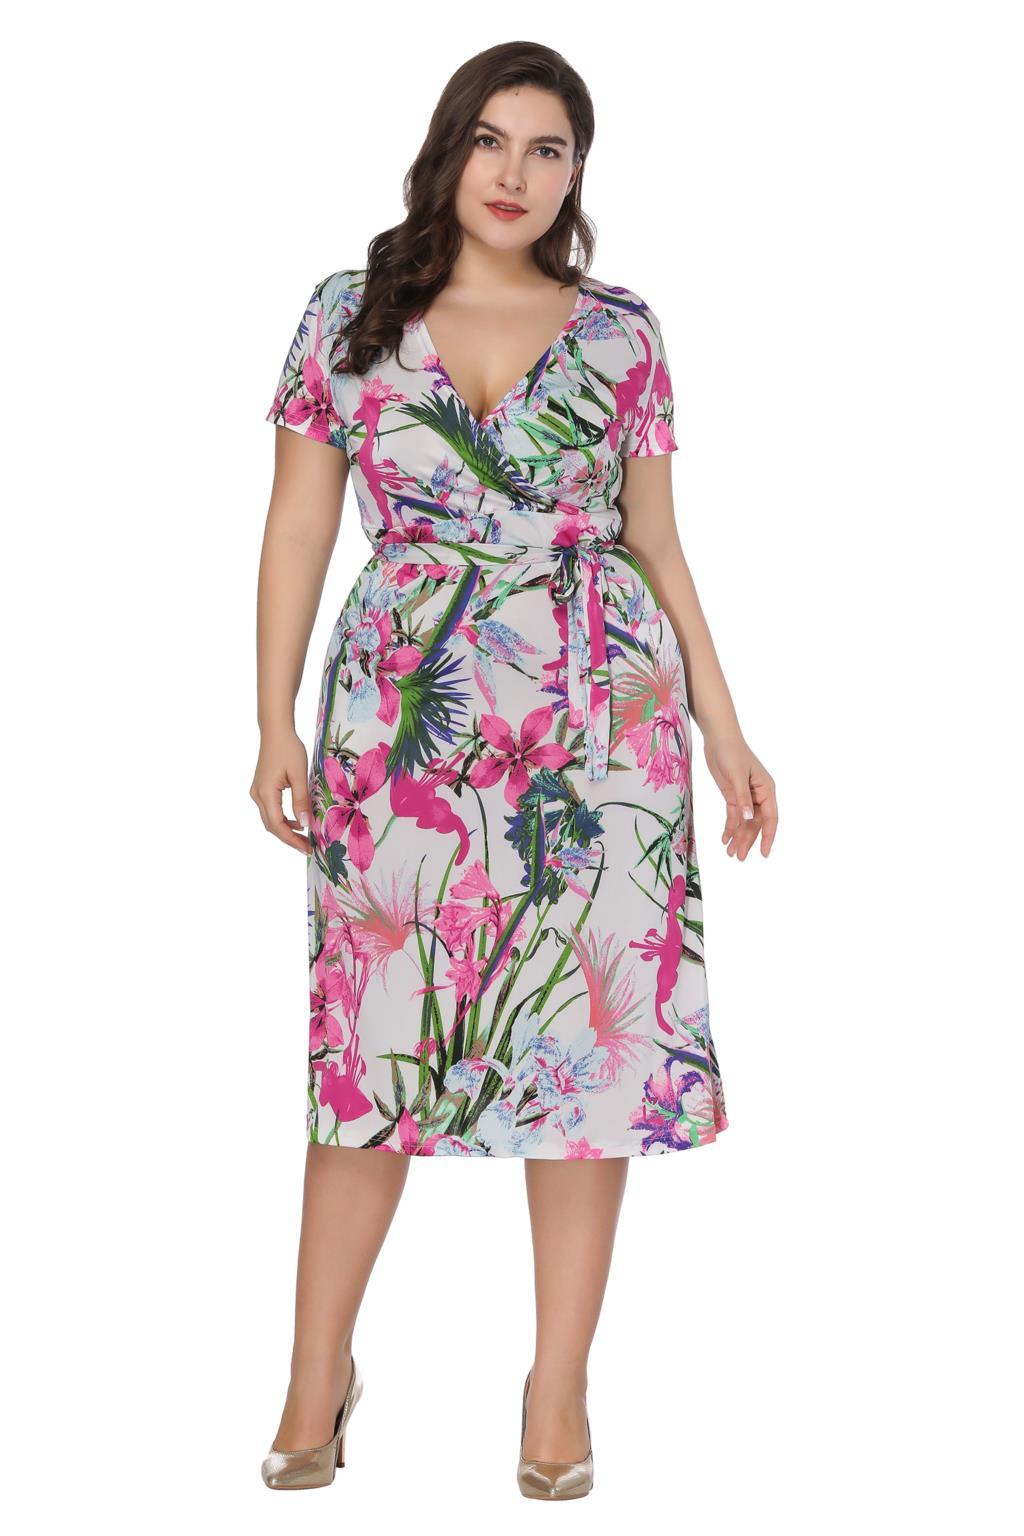 2018 Fashion Women Summer Short Sleeve Dress 6XL Plus Size Women Clothing V  Neck Floral Print Casual Dress Boho Beach Vestidos a3b3335c15a8